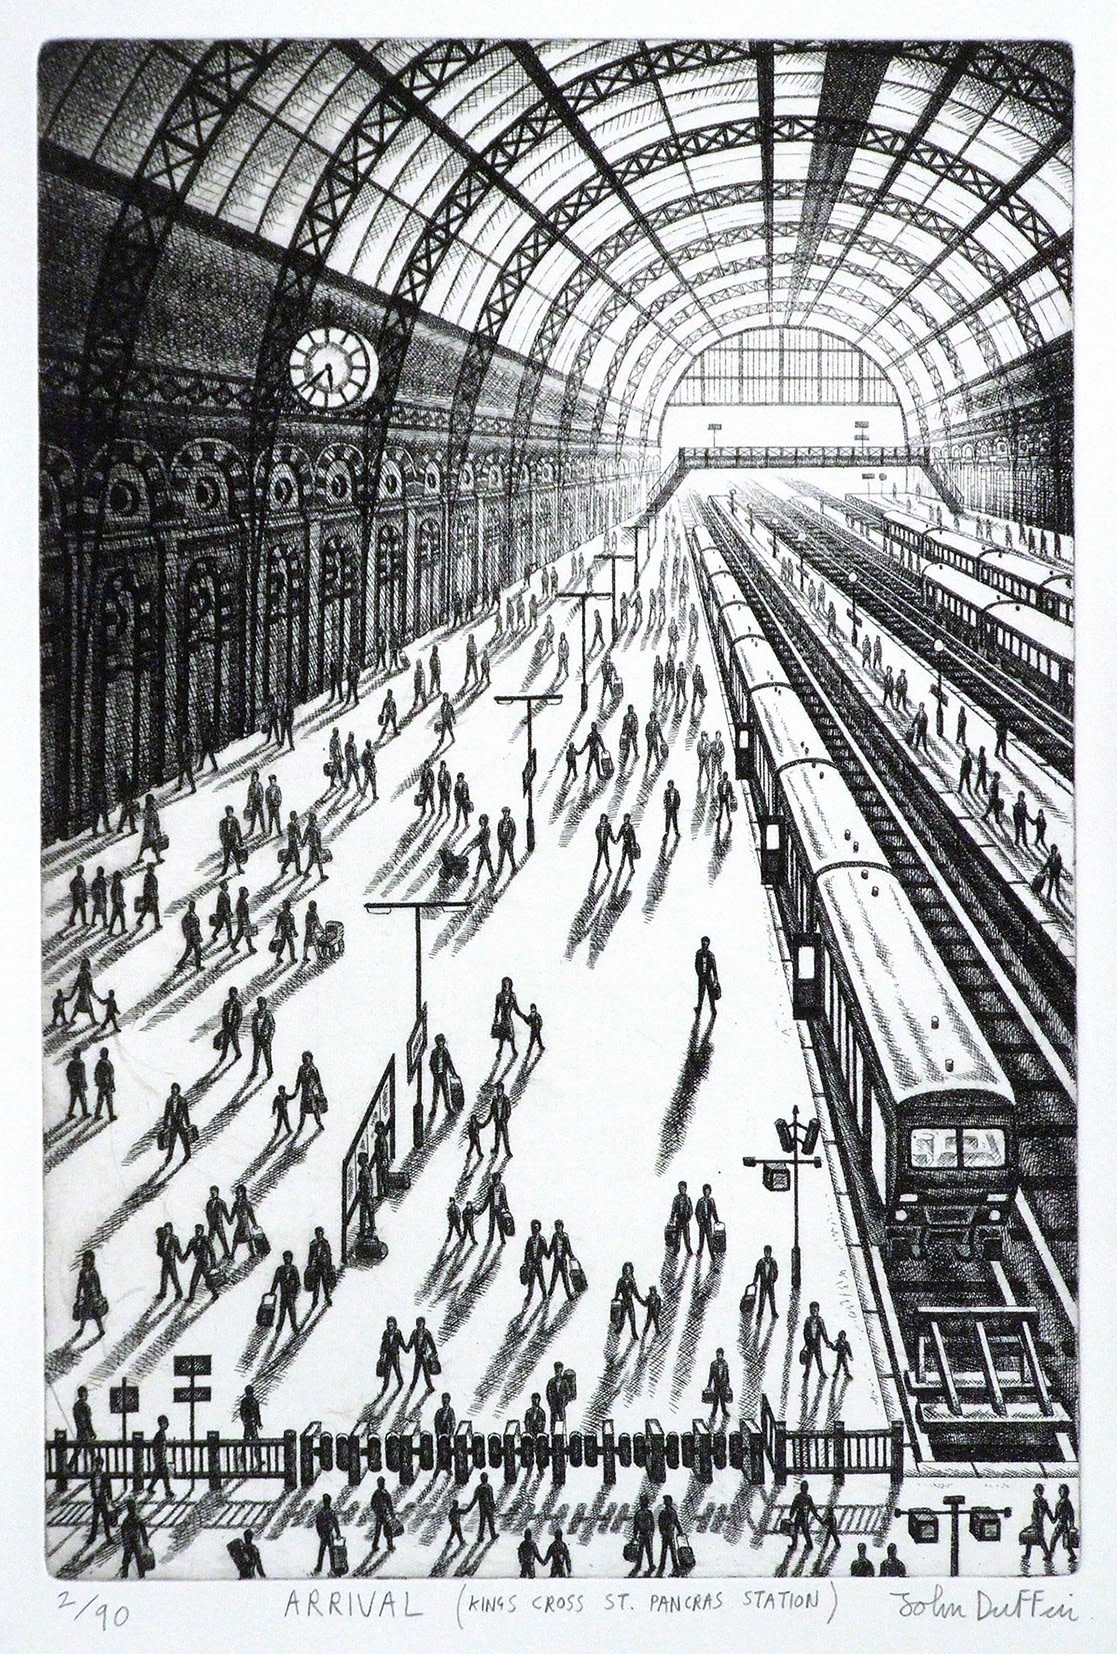 "<span class=""link fancybox-details-link""><a href=""/exhibitions/23/works/artworks_standalone10964/"">View Detail Page</a></span><div class=""artist""><span class=""artist""><strong>John Duffin RE</strong></span></div><div class=""title""><em>Arrival - Kings Cross St Pancras Station</em></div><div class=""medium"">etching</div><div class=""dimensions"">50 x 50cm paper size<br>38 x 25 cm image size</div><div class=""edition_details"">Artist proof</div>"